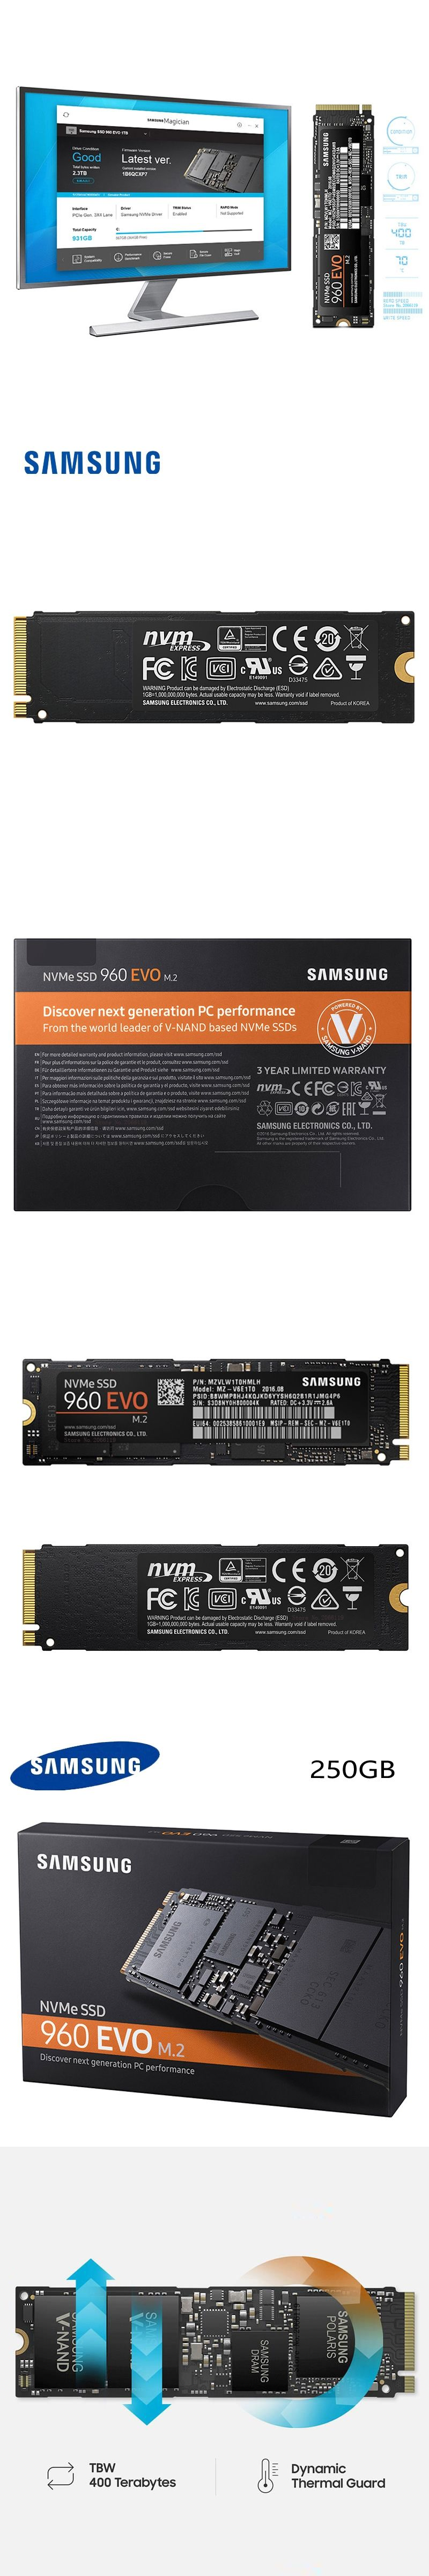 Samsung 960 Evo 250gb Nvme M2 Ssd Solid State Hard Disk Mz